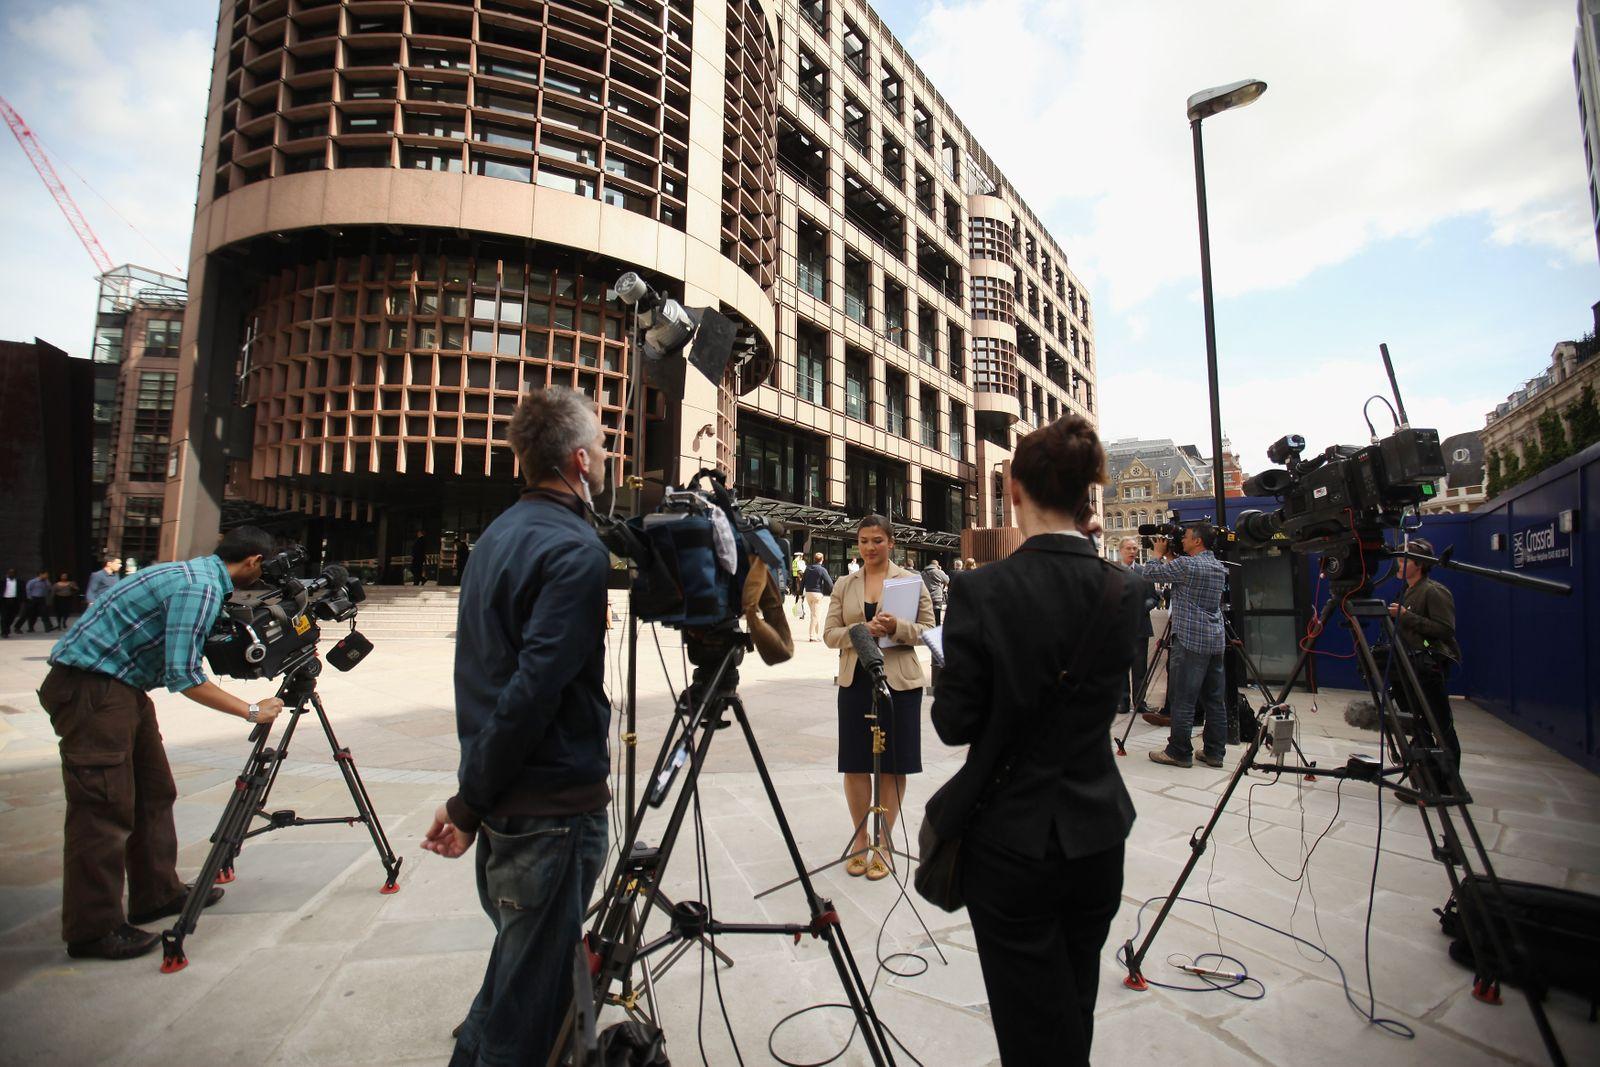 UBS / Festnehme / Journalisten